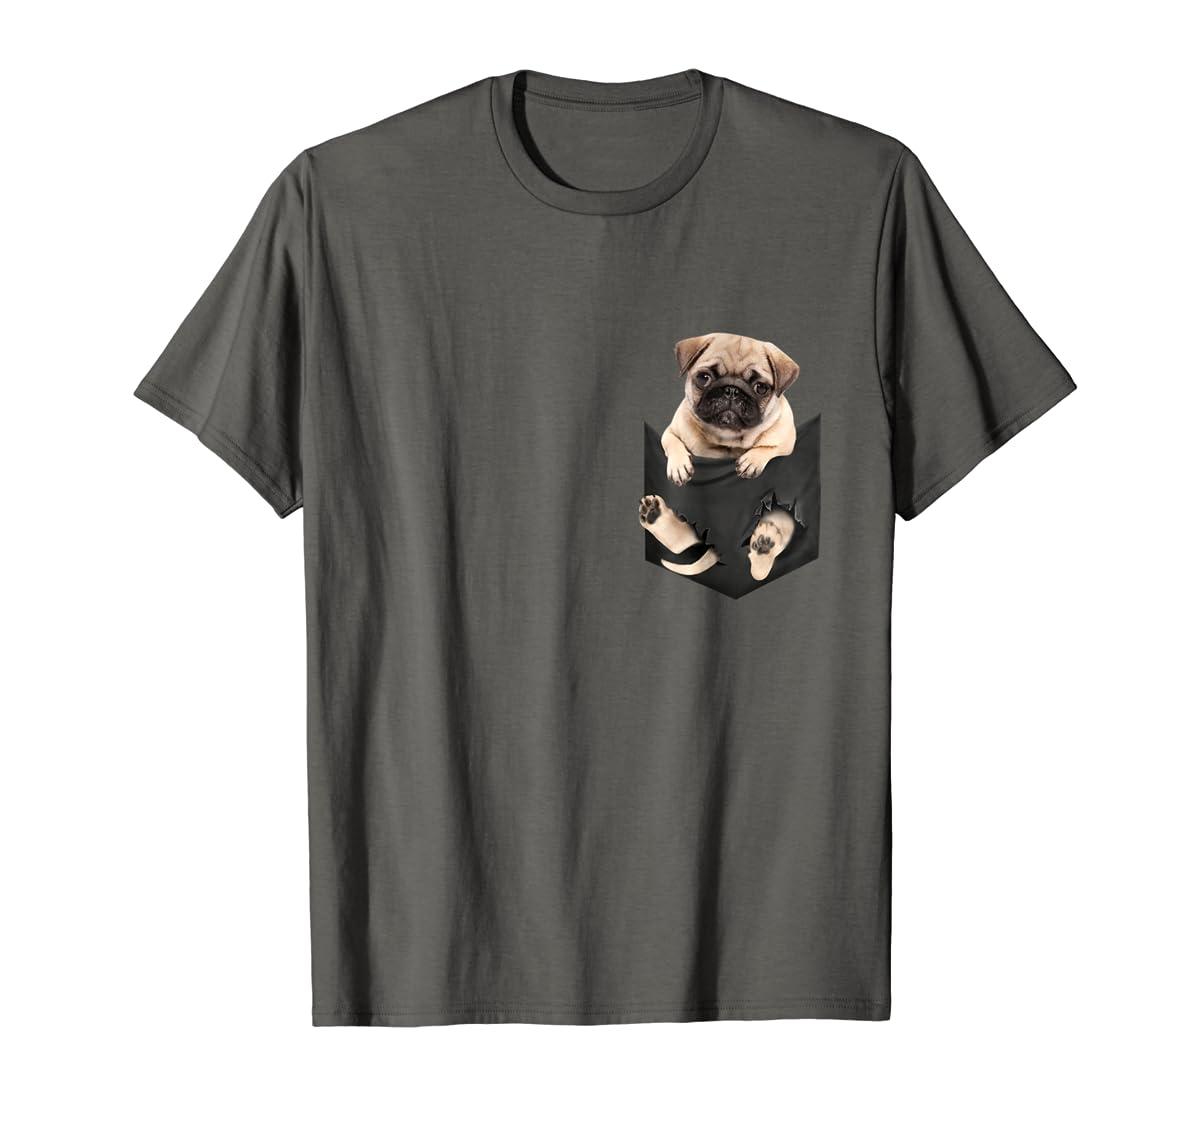 Dog in Your Pocket santa hat pug lover gift shirt-Men's T-Shirt-Dark Heather